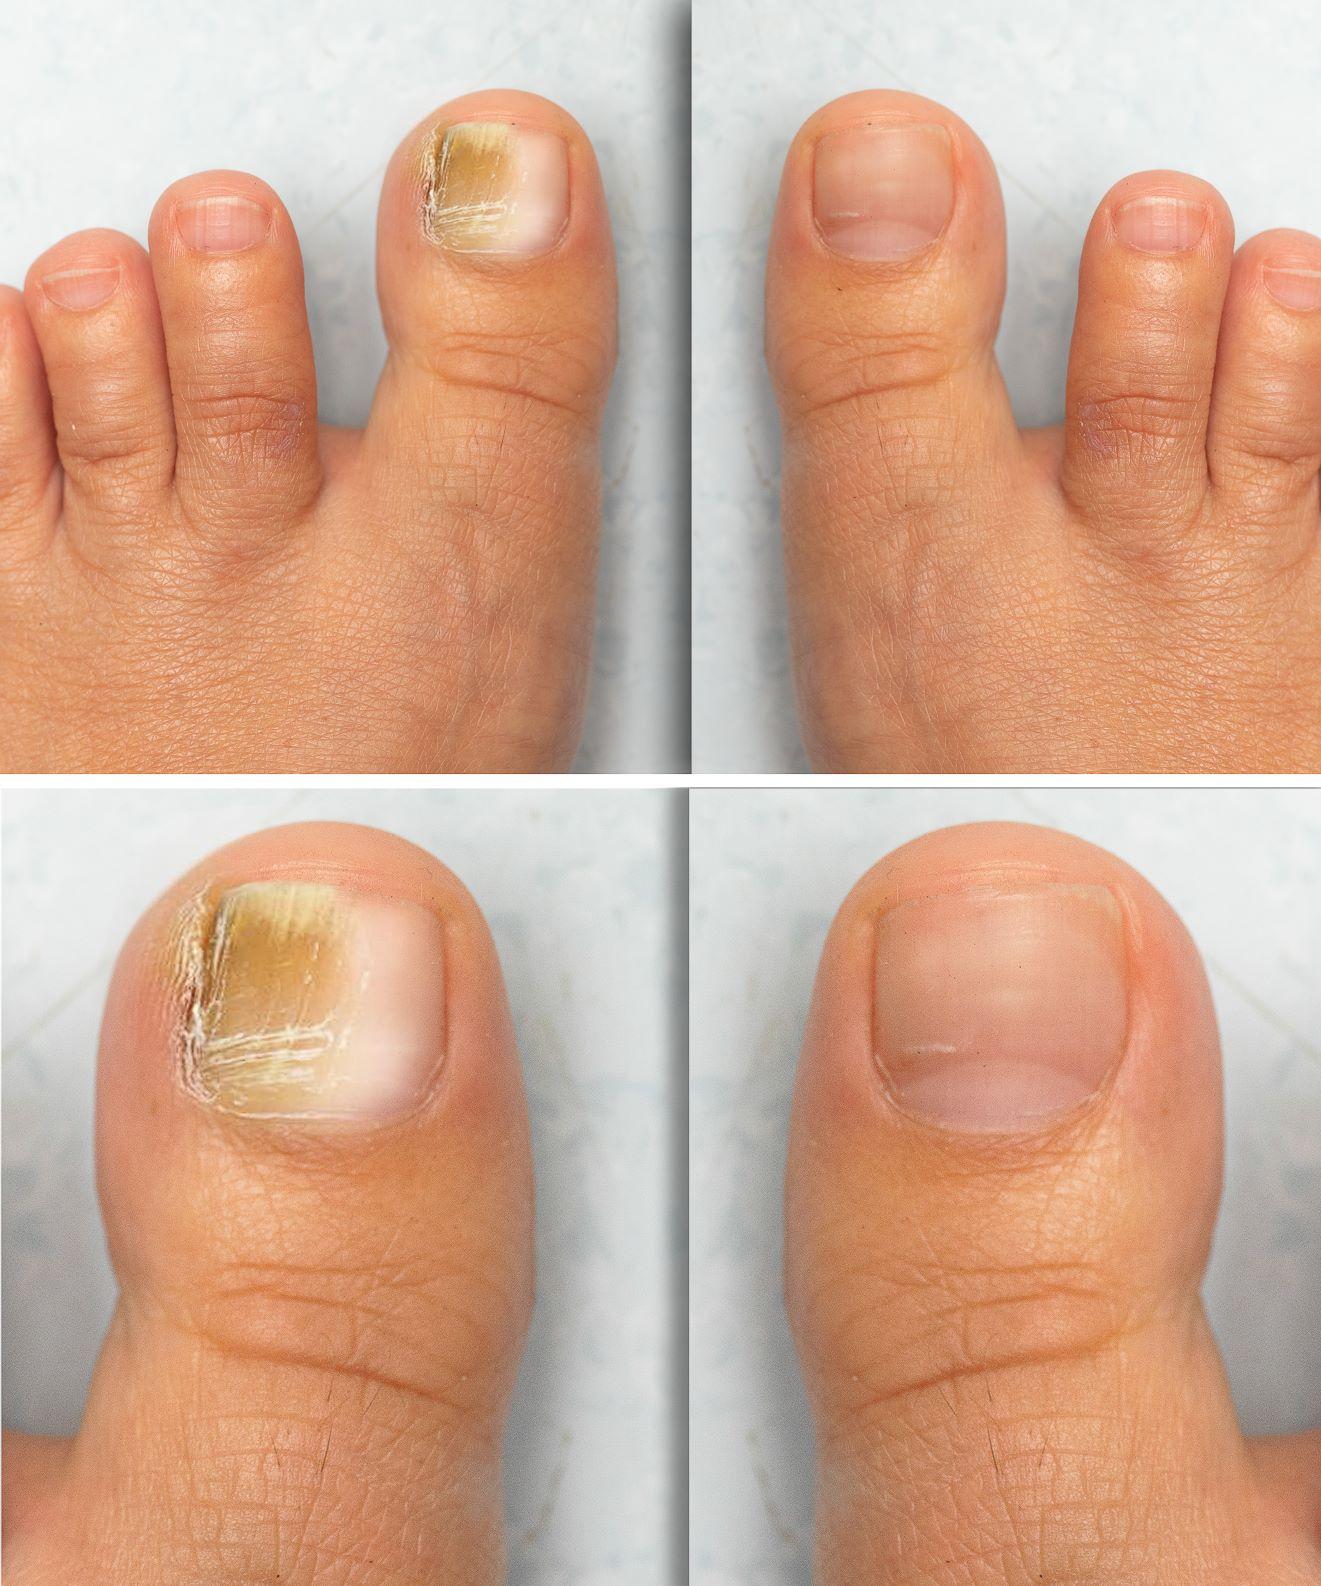 nail fungus infection Honolulu